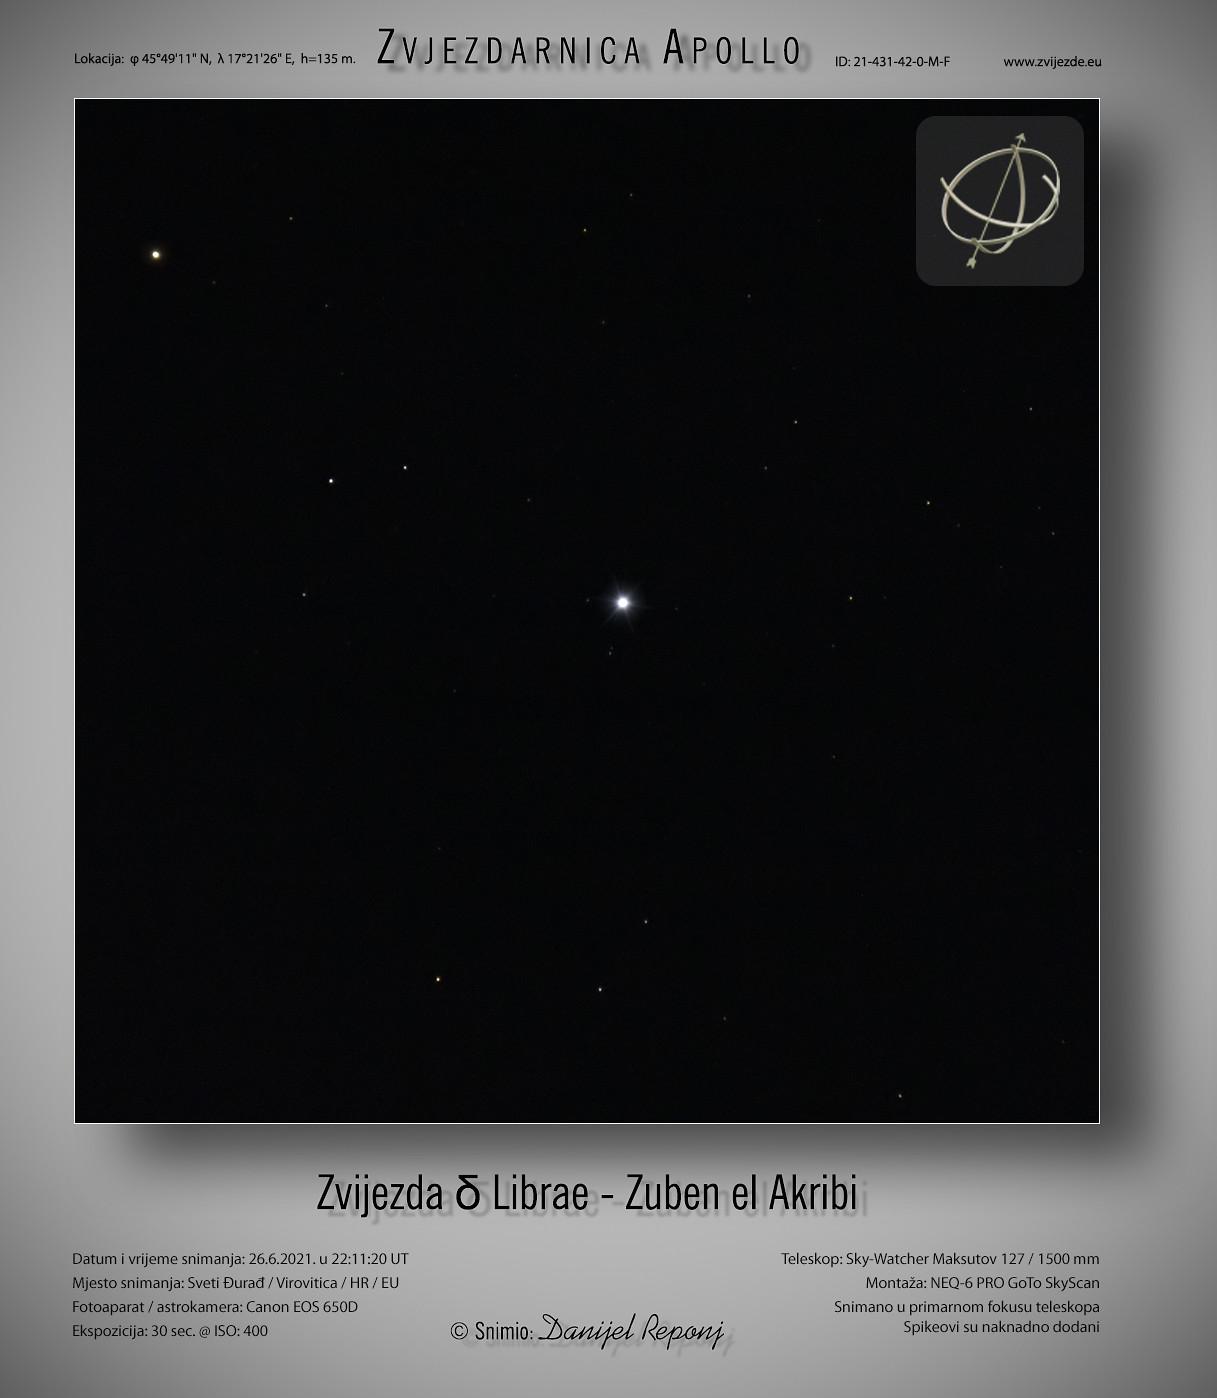 Zvijezda δ Librae - Zuben el Akribi, 26.6.2021.